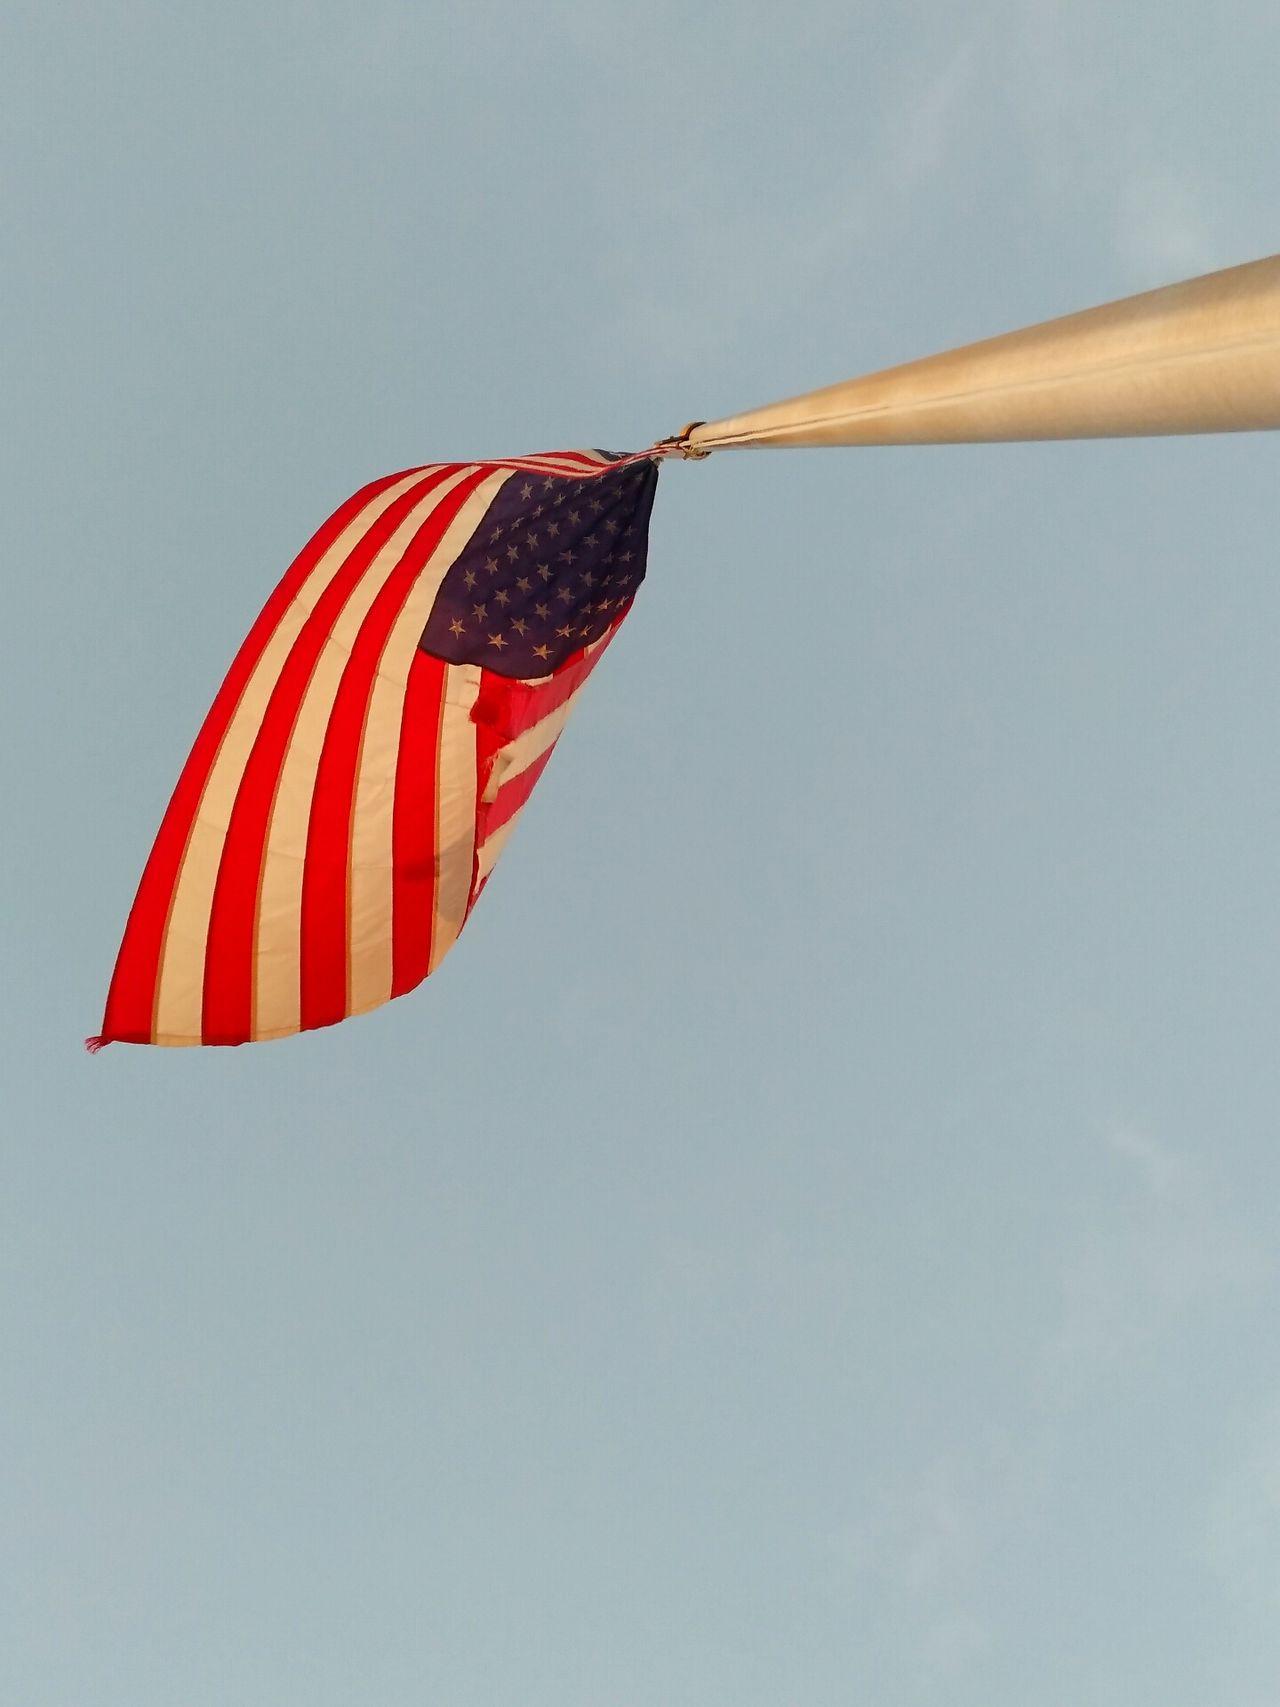 Patriotism No People Day Outdoors Sky America American Flag POTUS